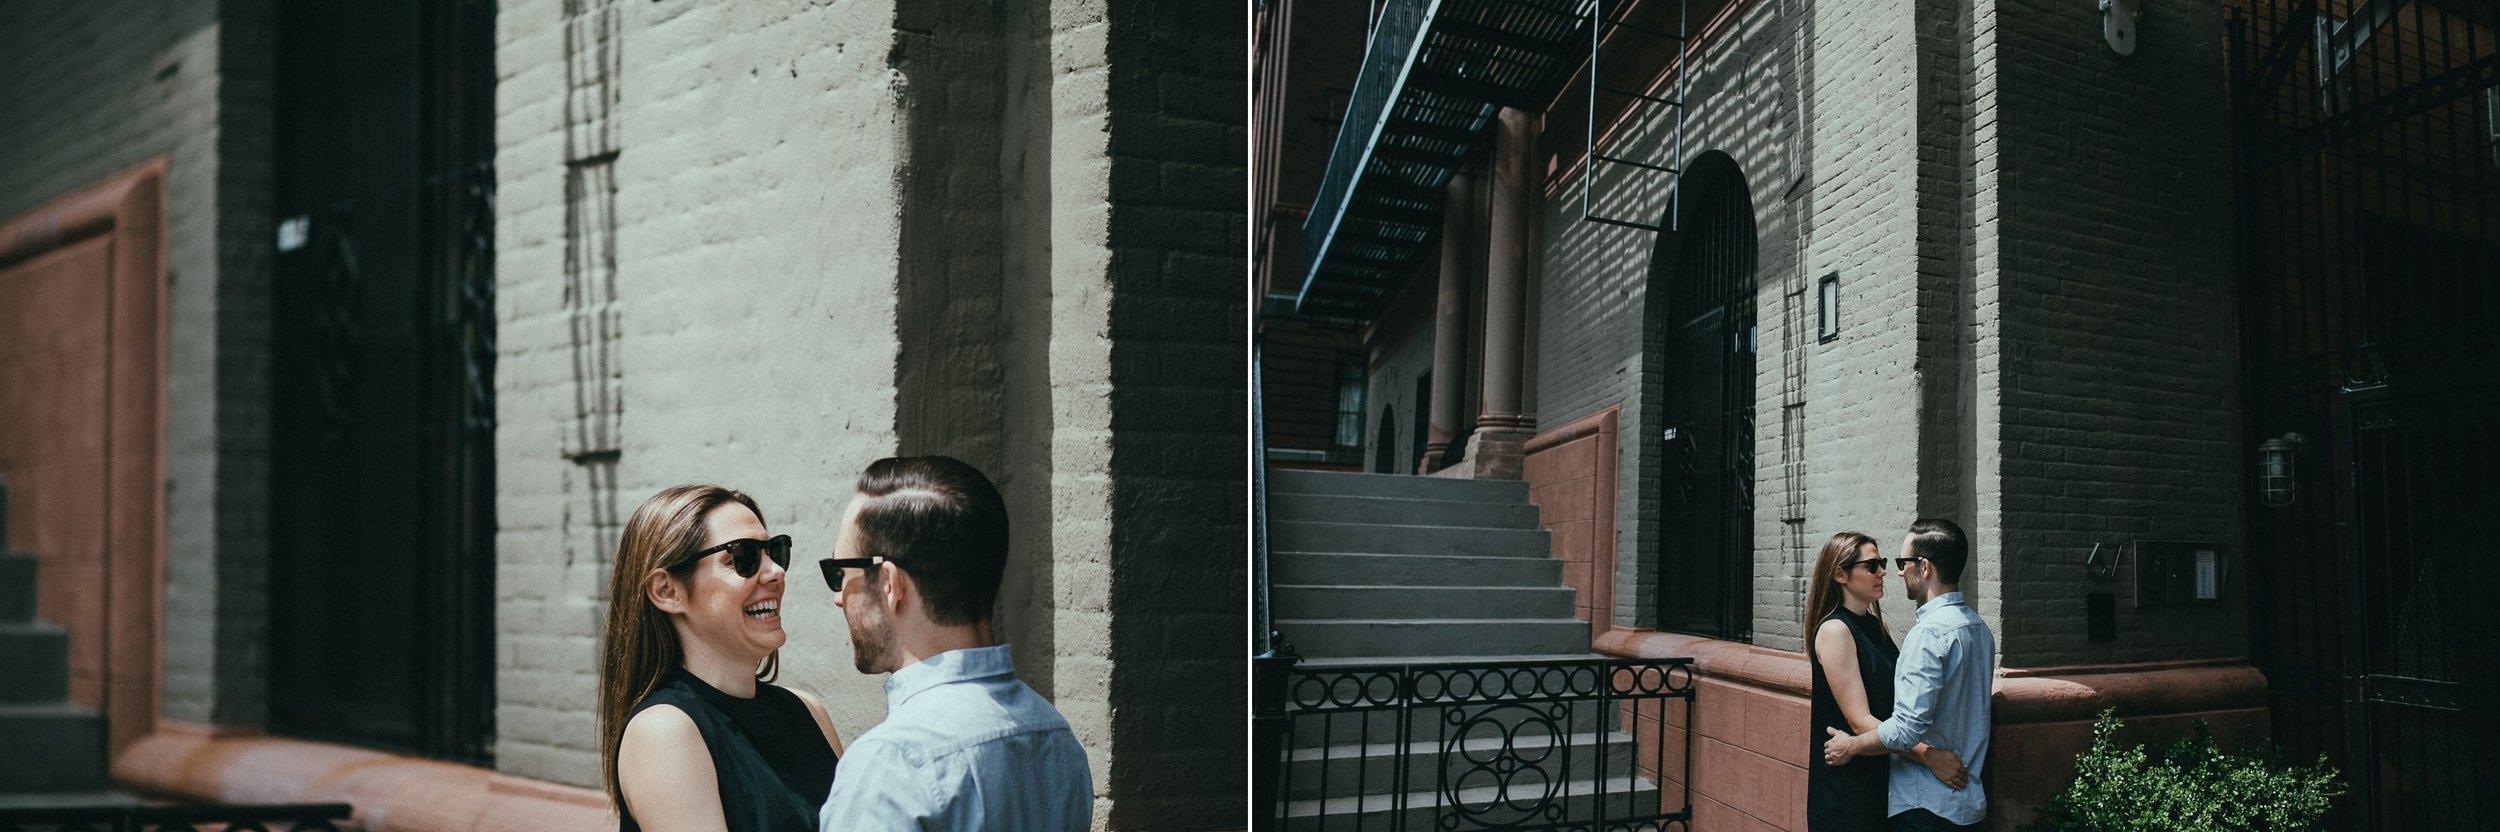 new-york-city-engagement18.jpg